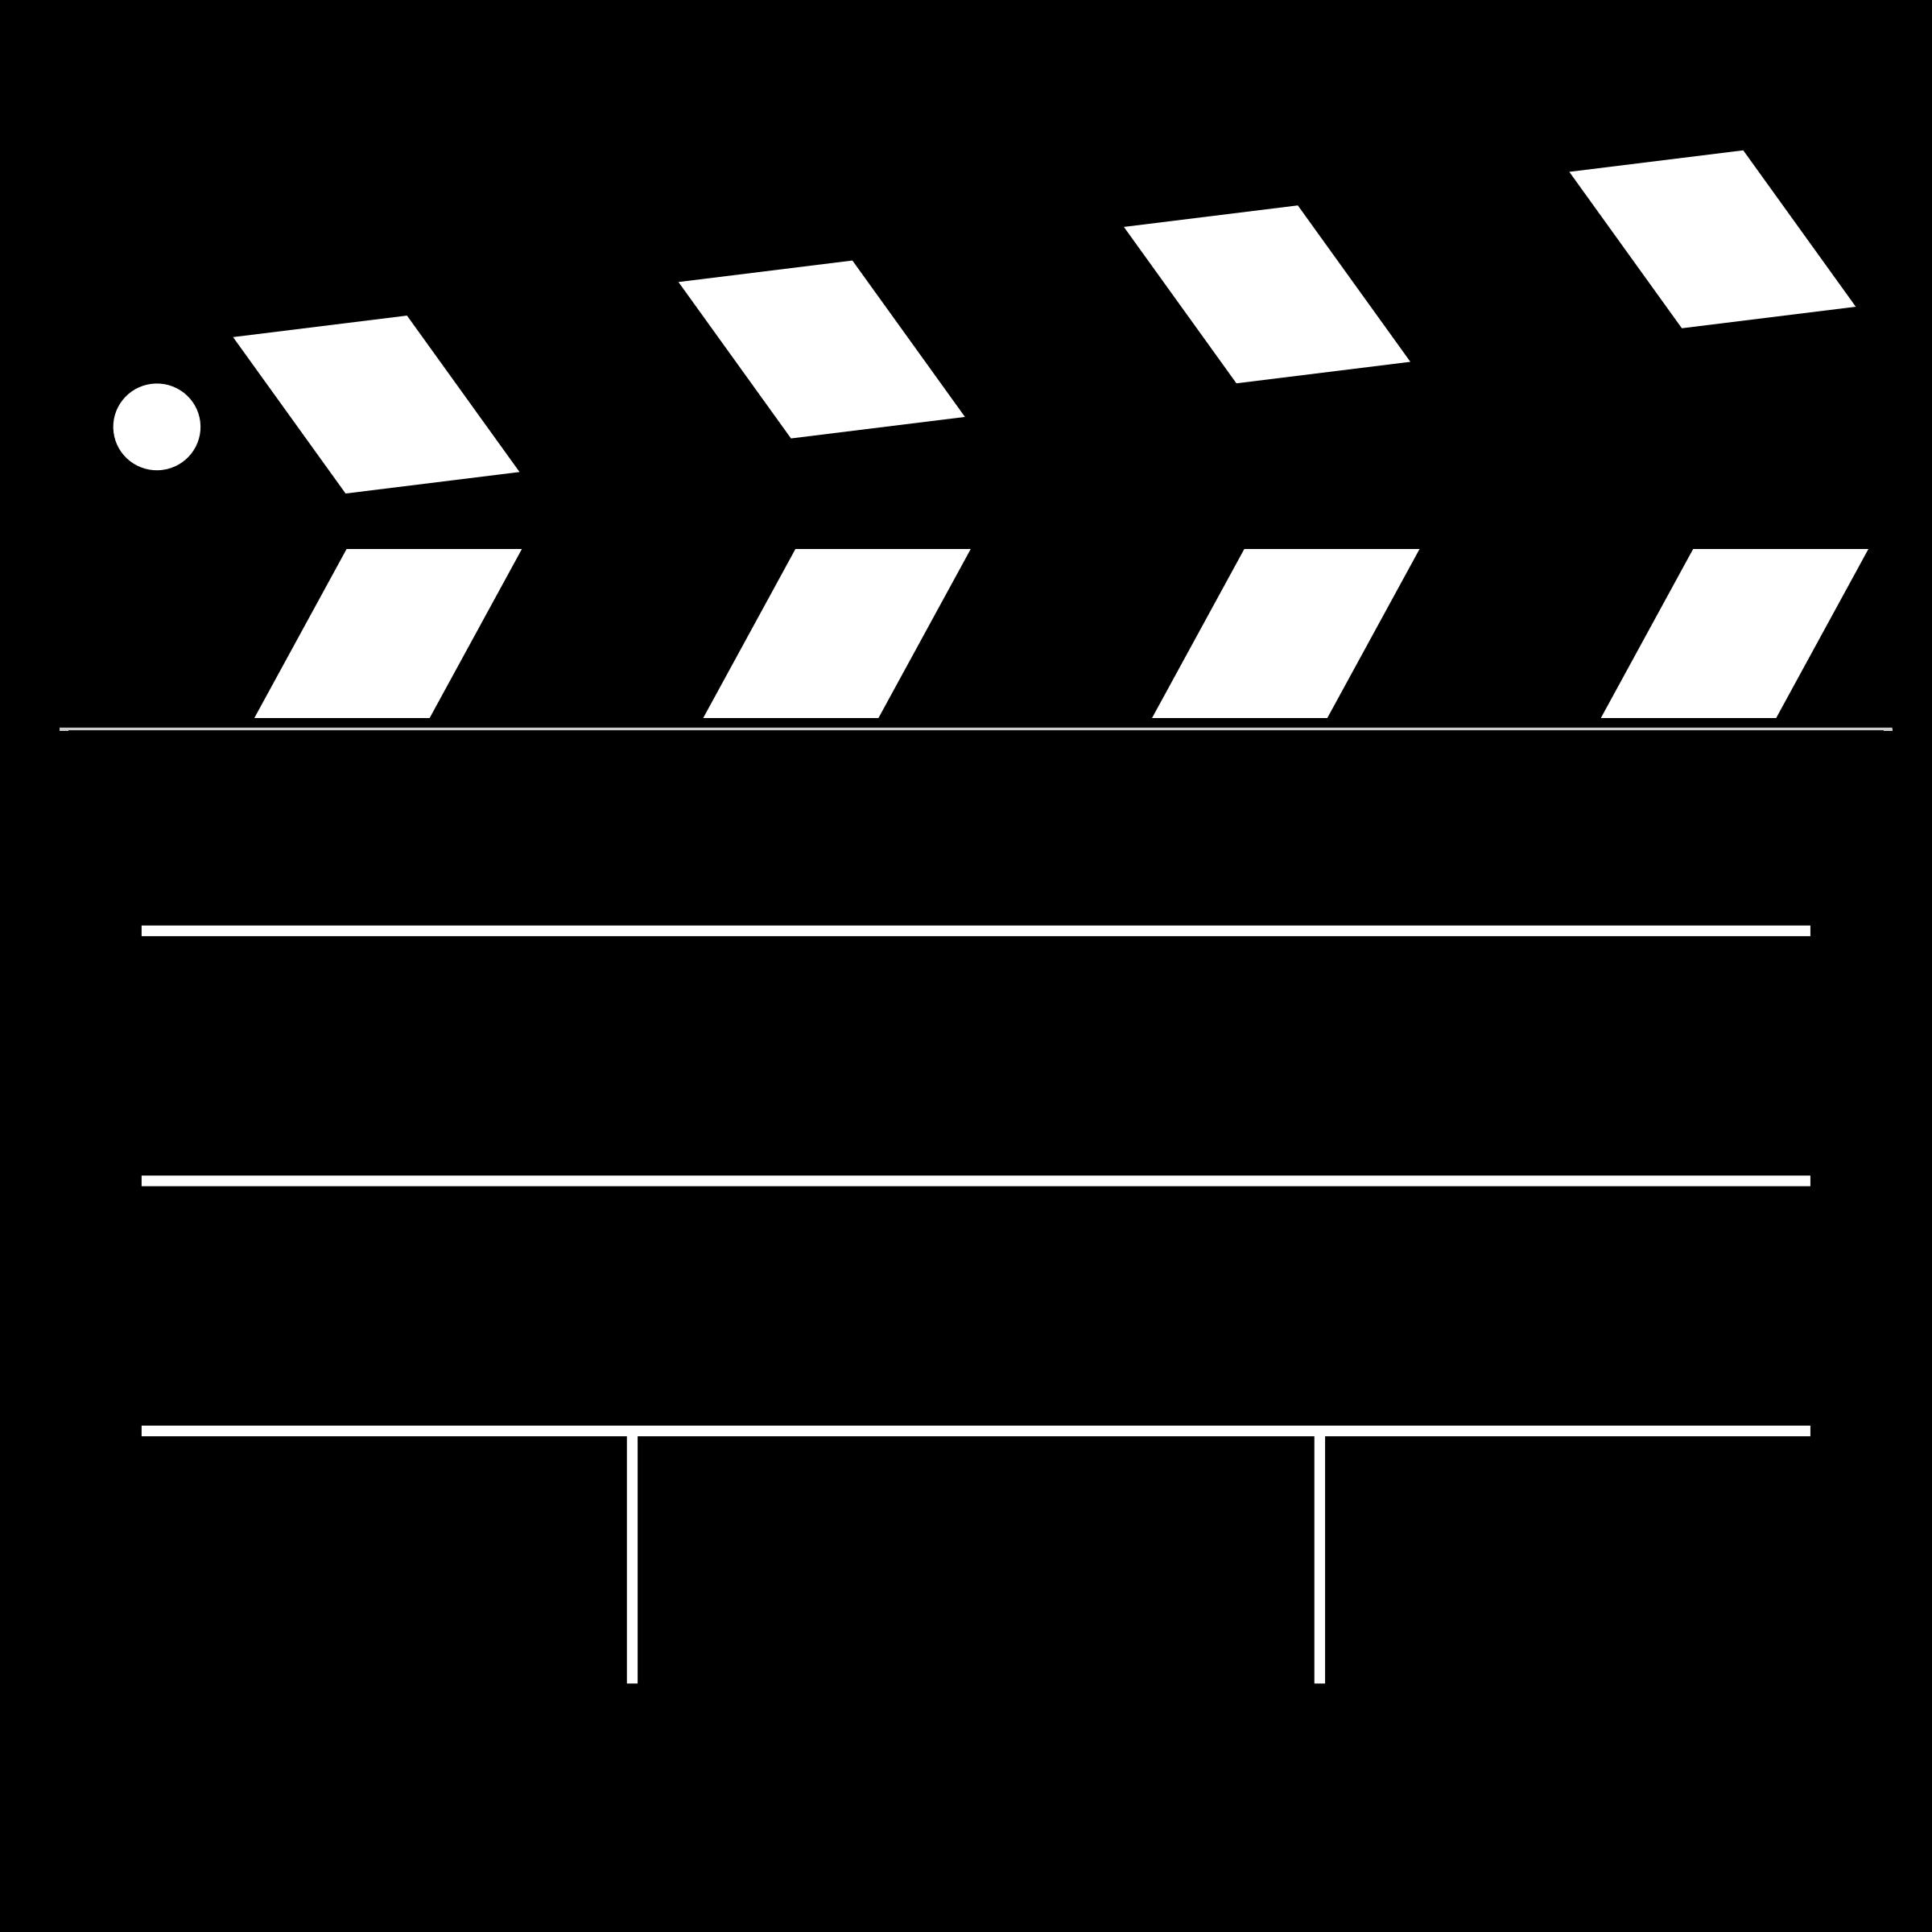 Movies clipart film slate, Movies film slate Transparent.